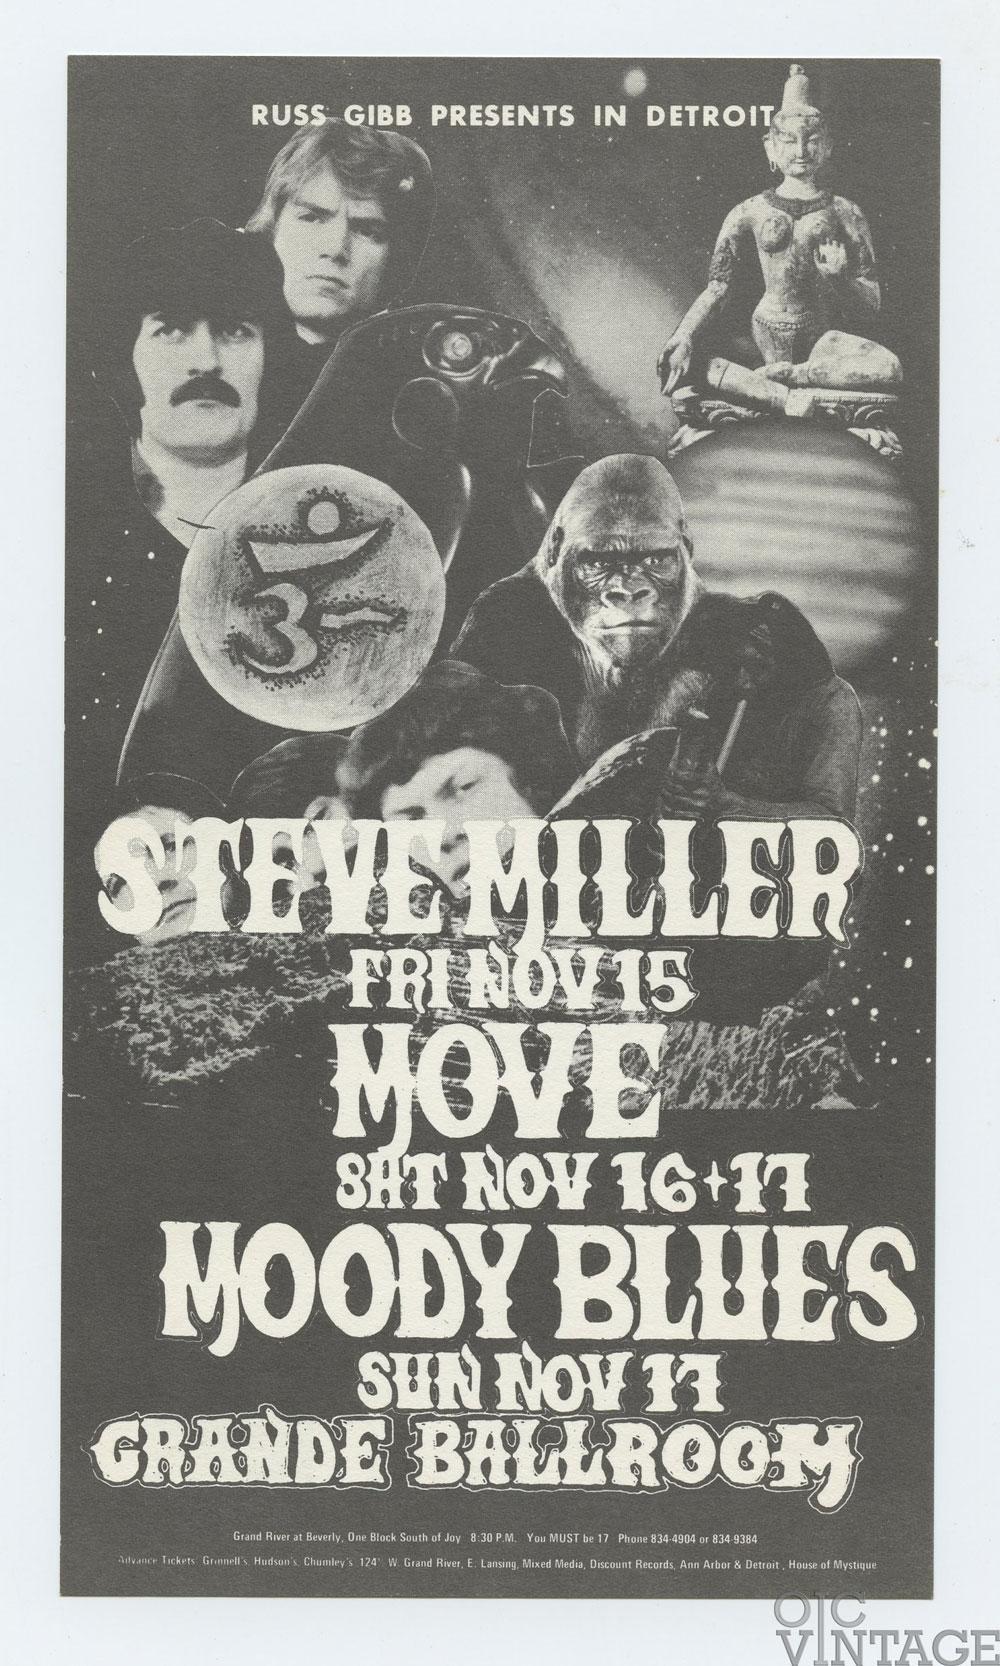 Grande Ballroom Postcard 1968 Nov 15 Steve Miller Move Moody Blues